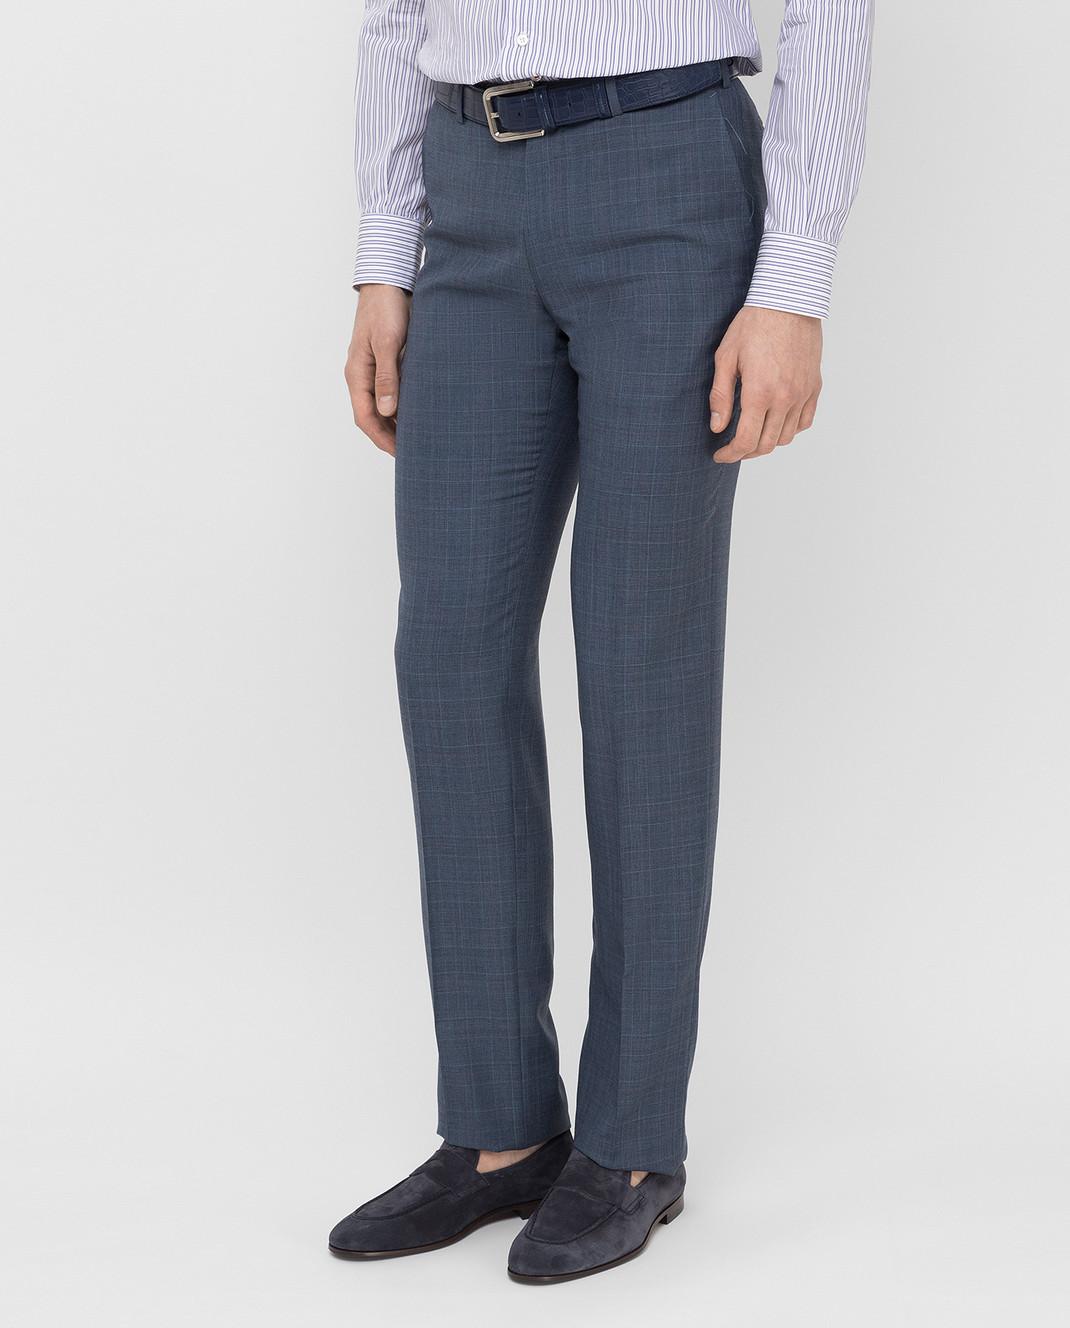 ISAIA Синие брюки из шерсти 0073153629F изображение 3